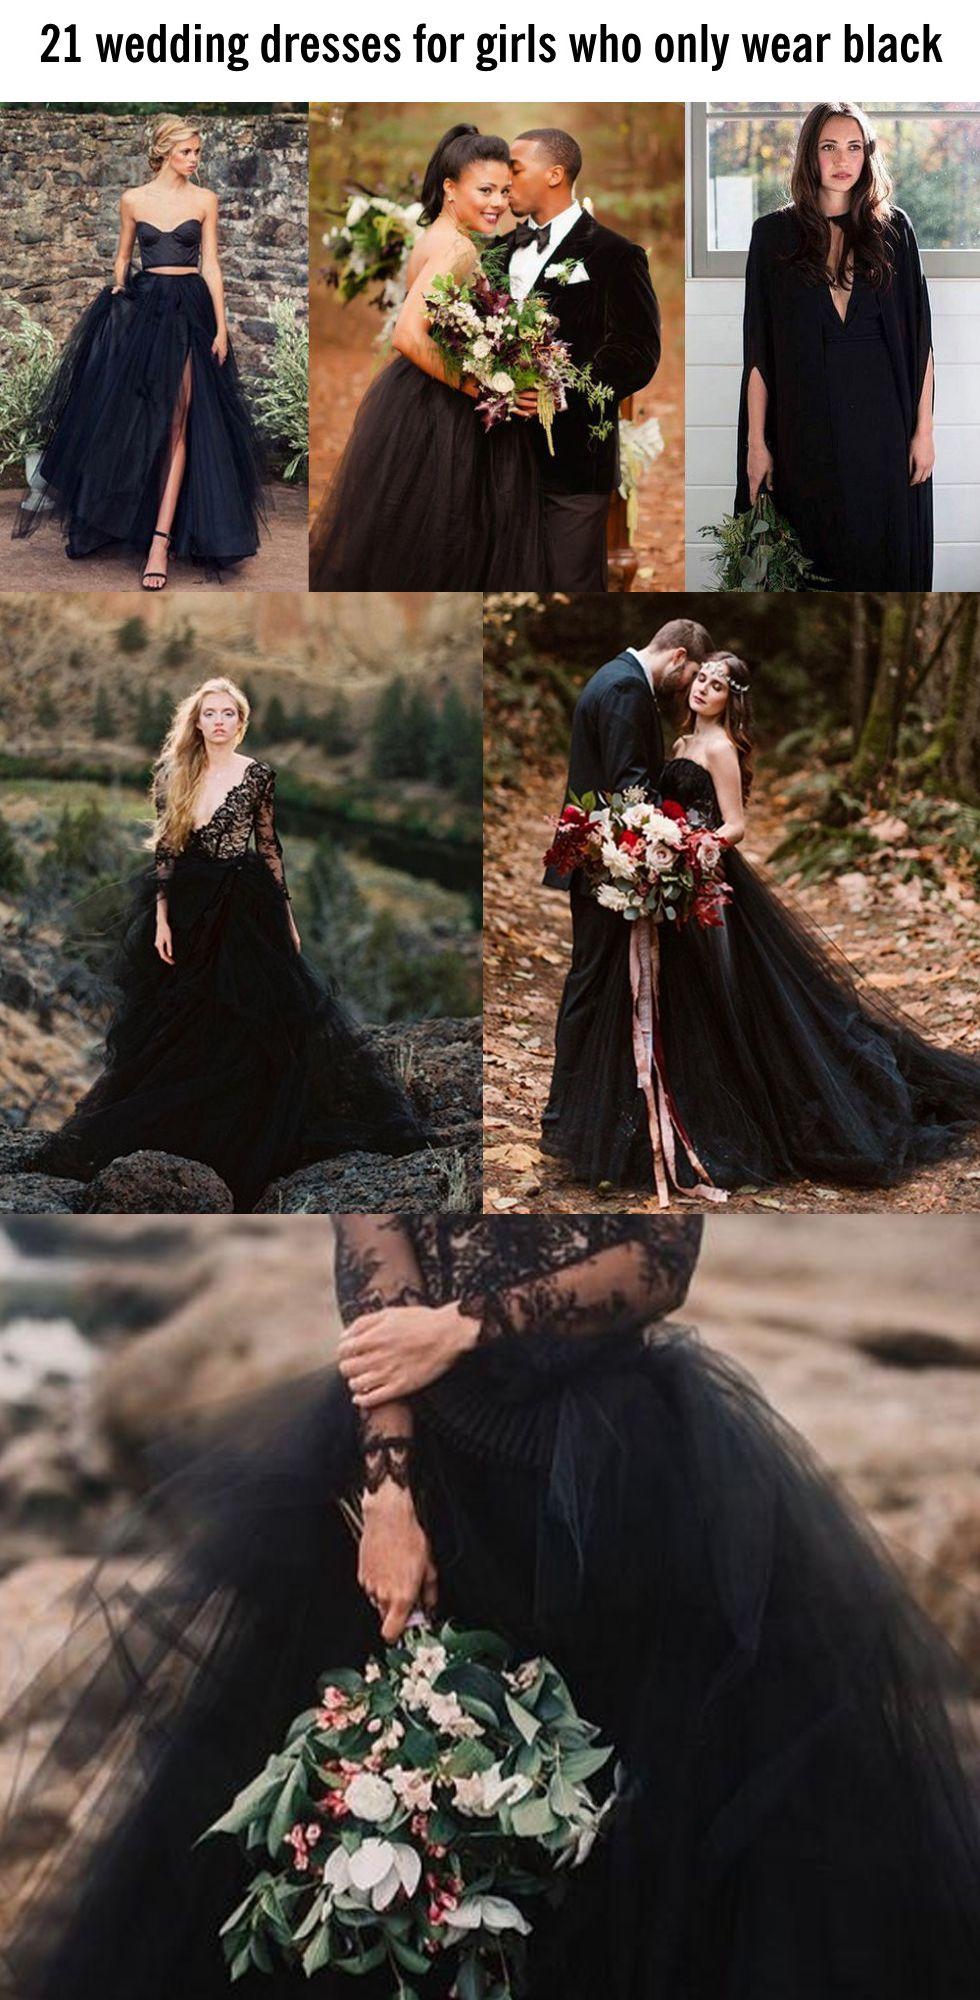 wedding dresses for girls who only wear black wedding ideas